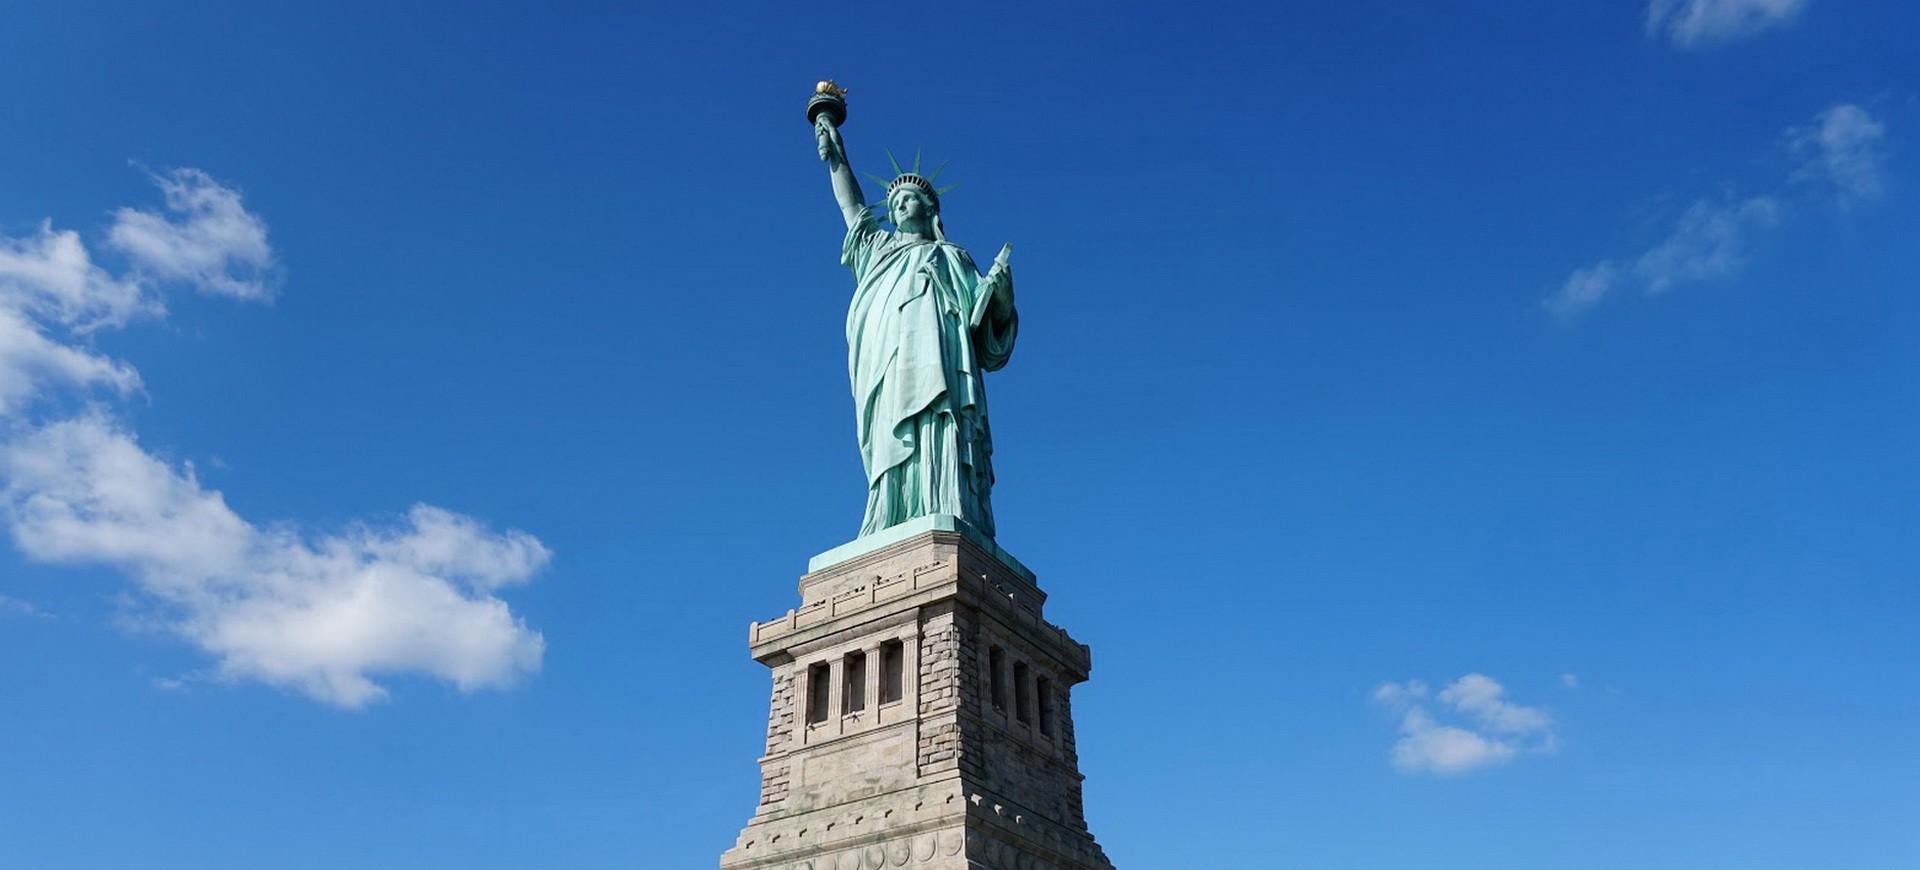 Etats Unis New York Statue de la Liberté